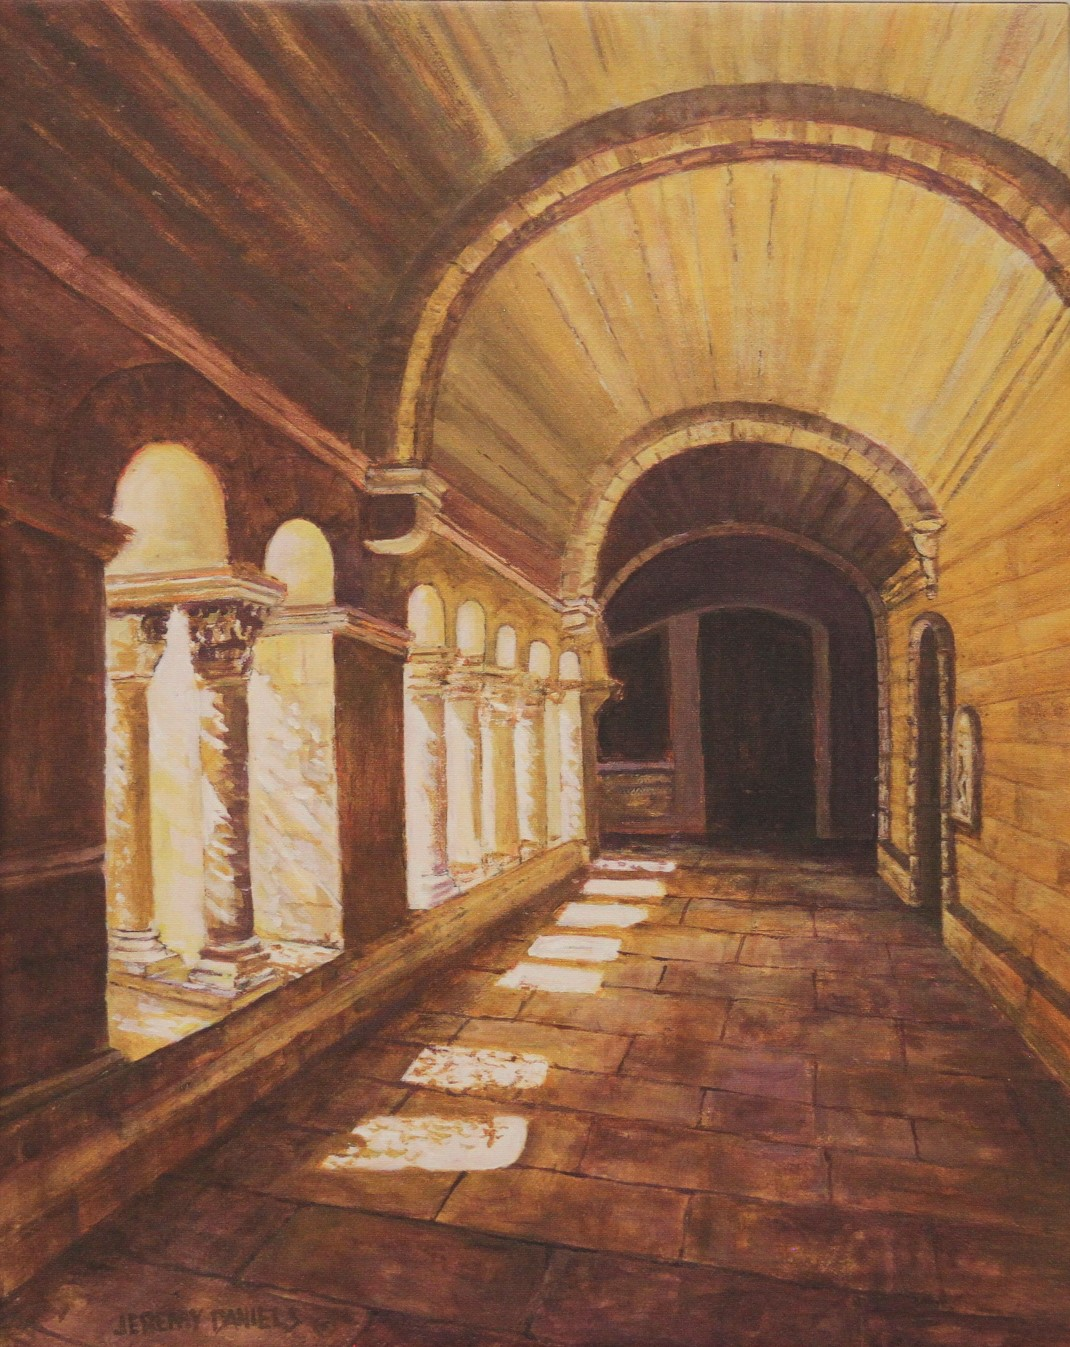 Cloister in Monastery Saint Paul de Mausole